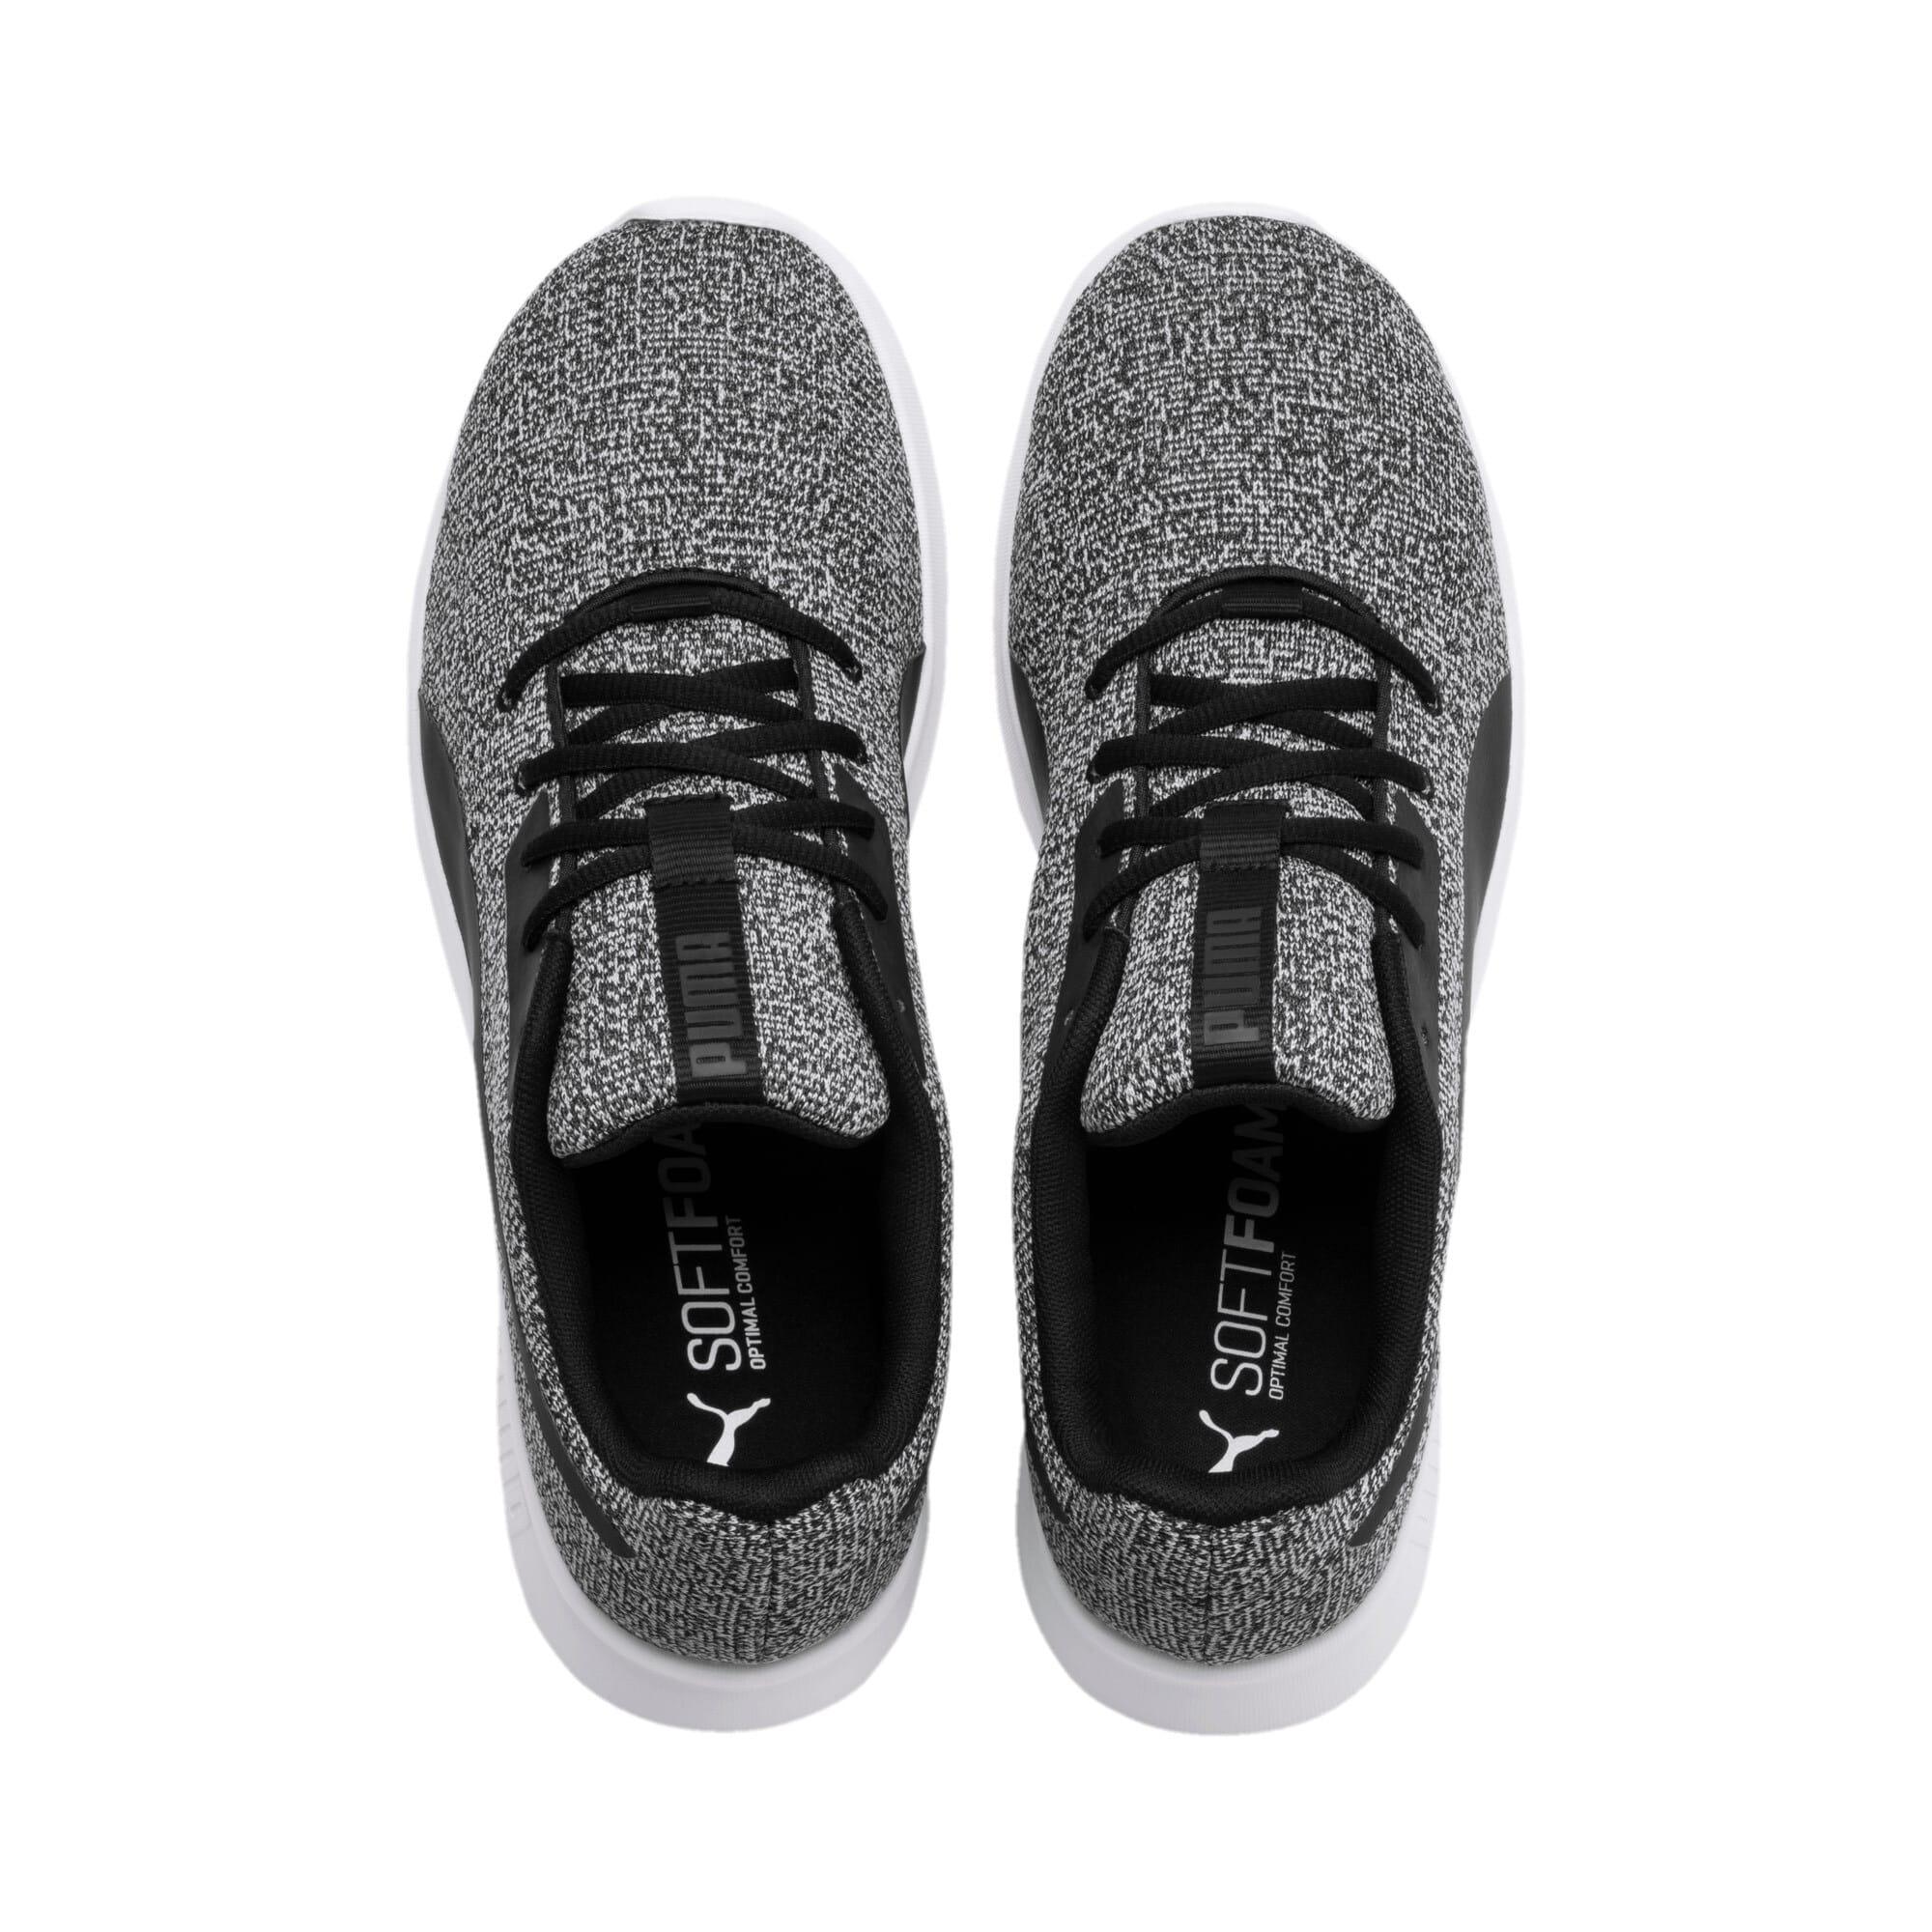 Thumbnail 8 of Modern Runner Sneakers, Gray Violet-Puma Black, medium-IND